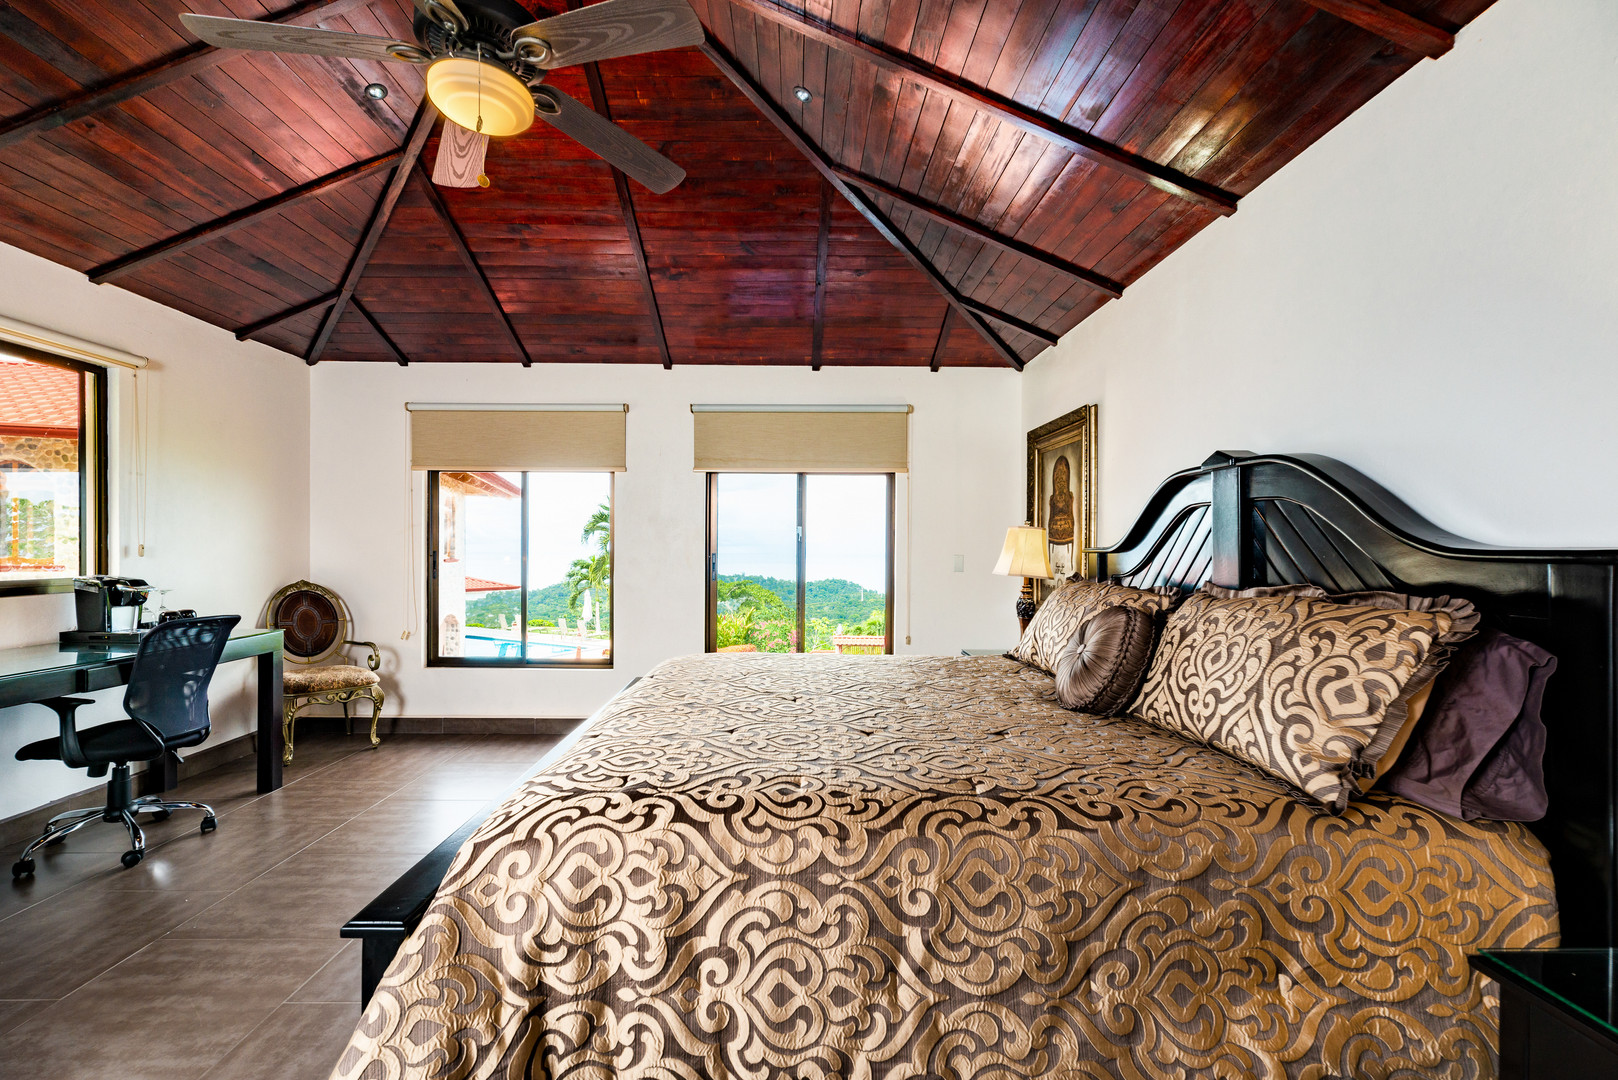 The Mariposa Room